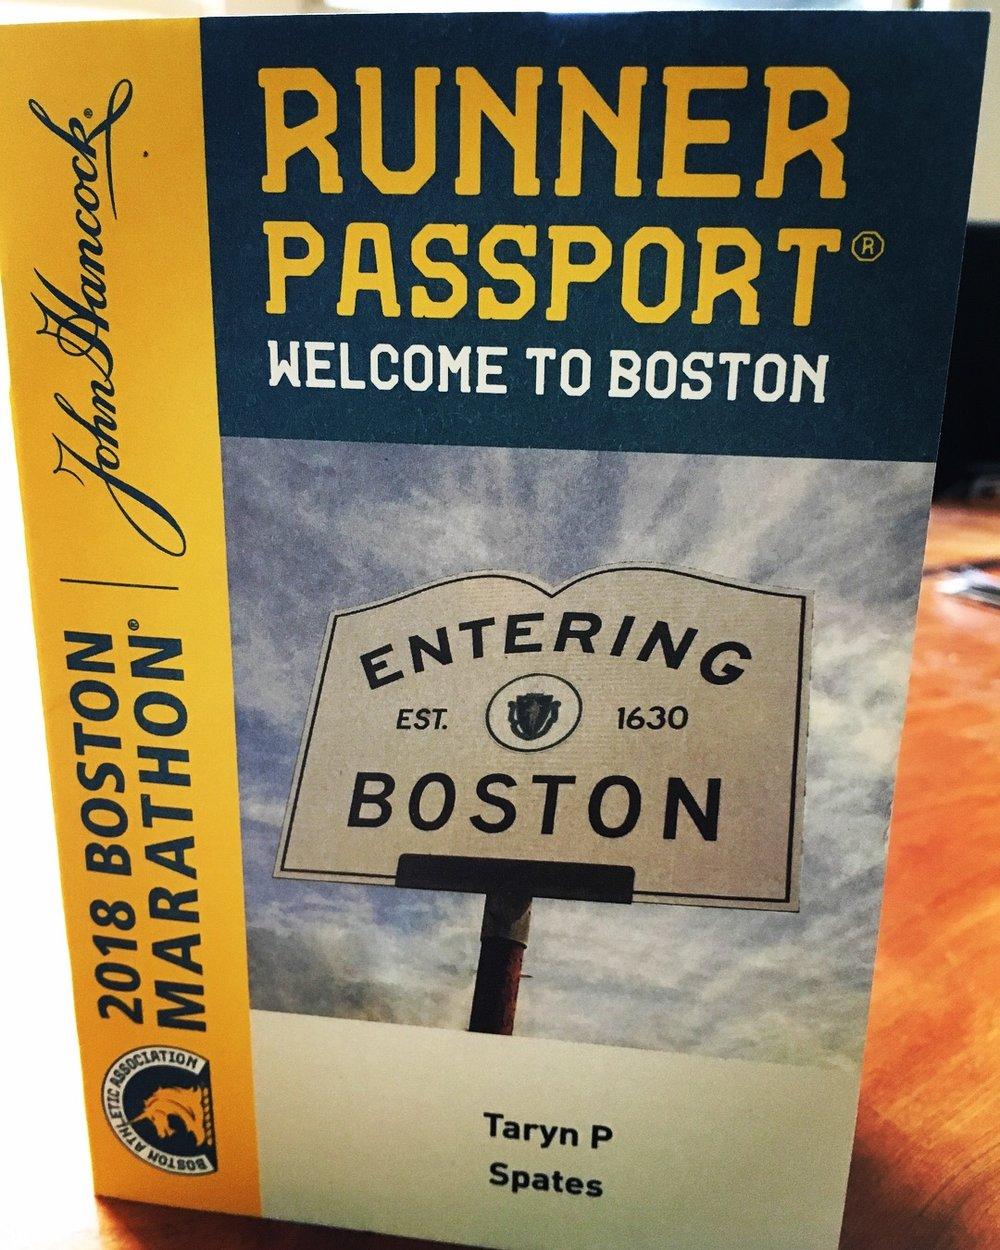 passport_front.jpg